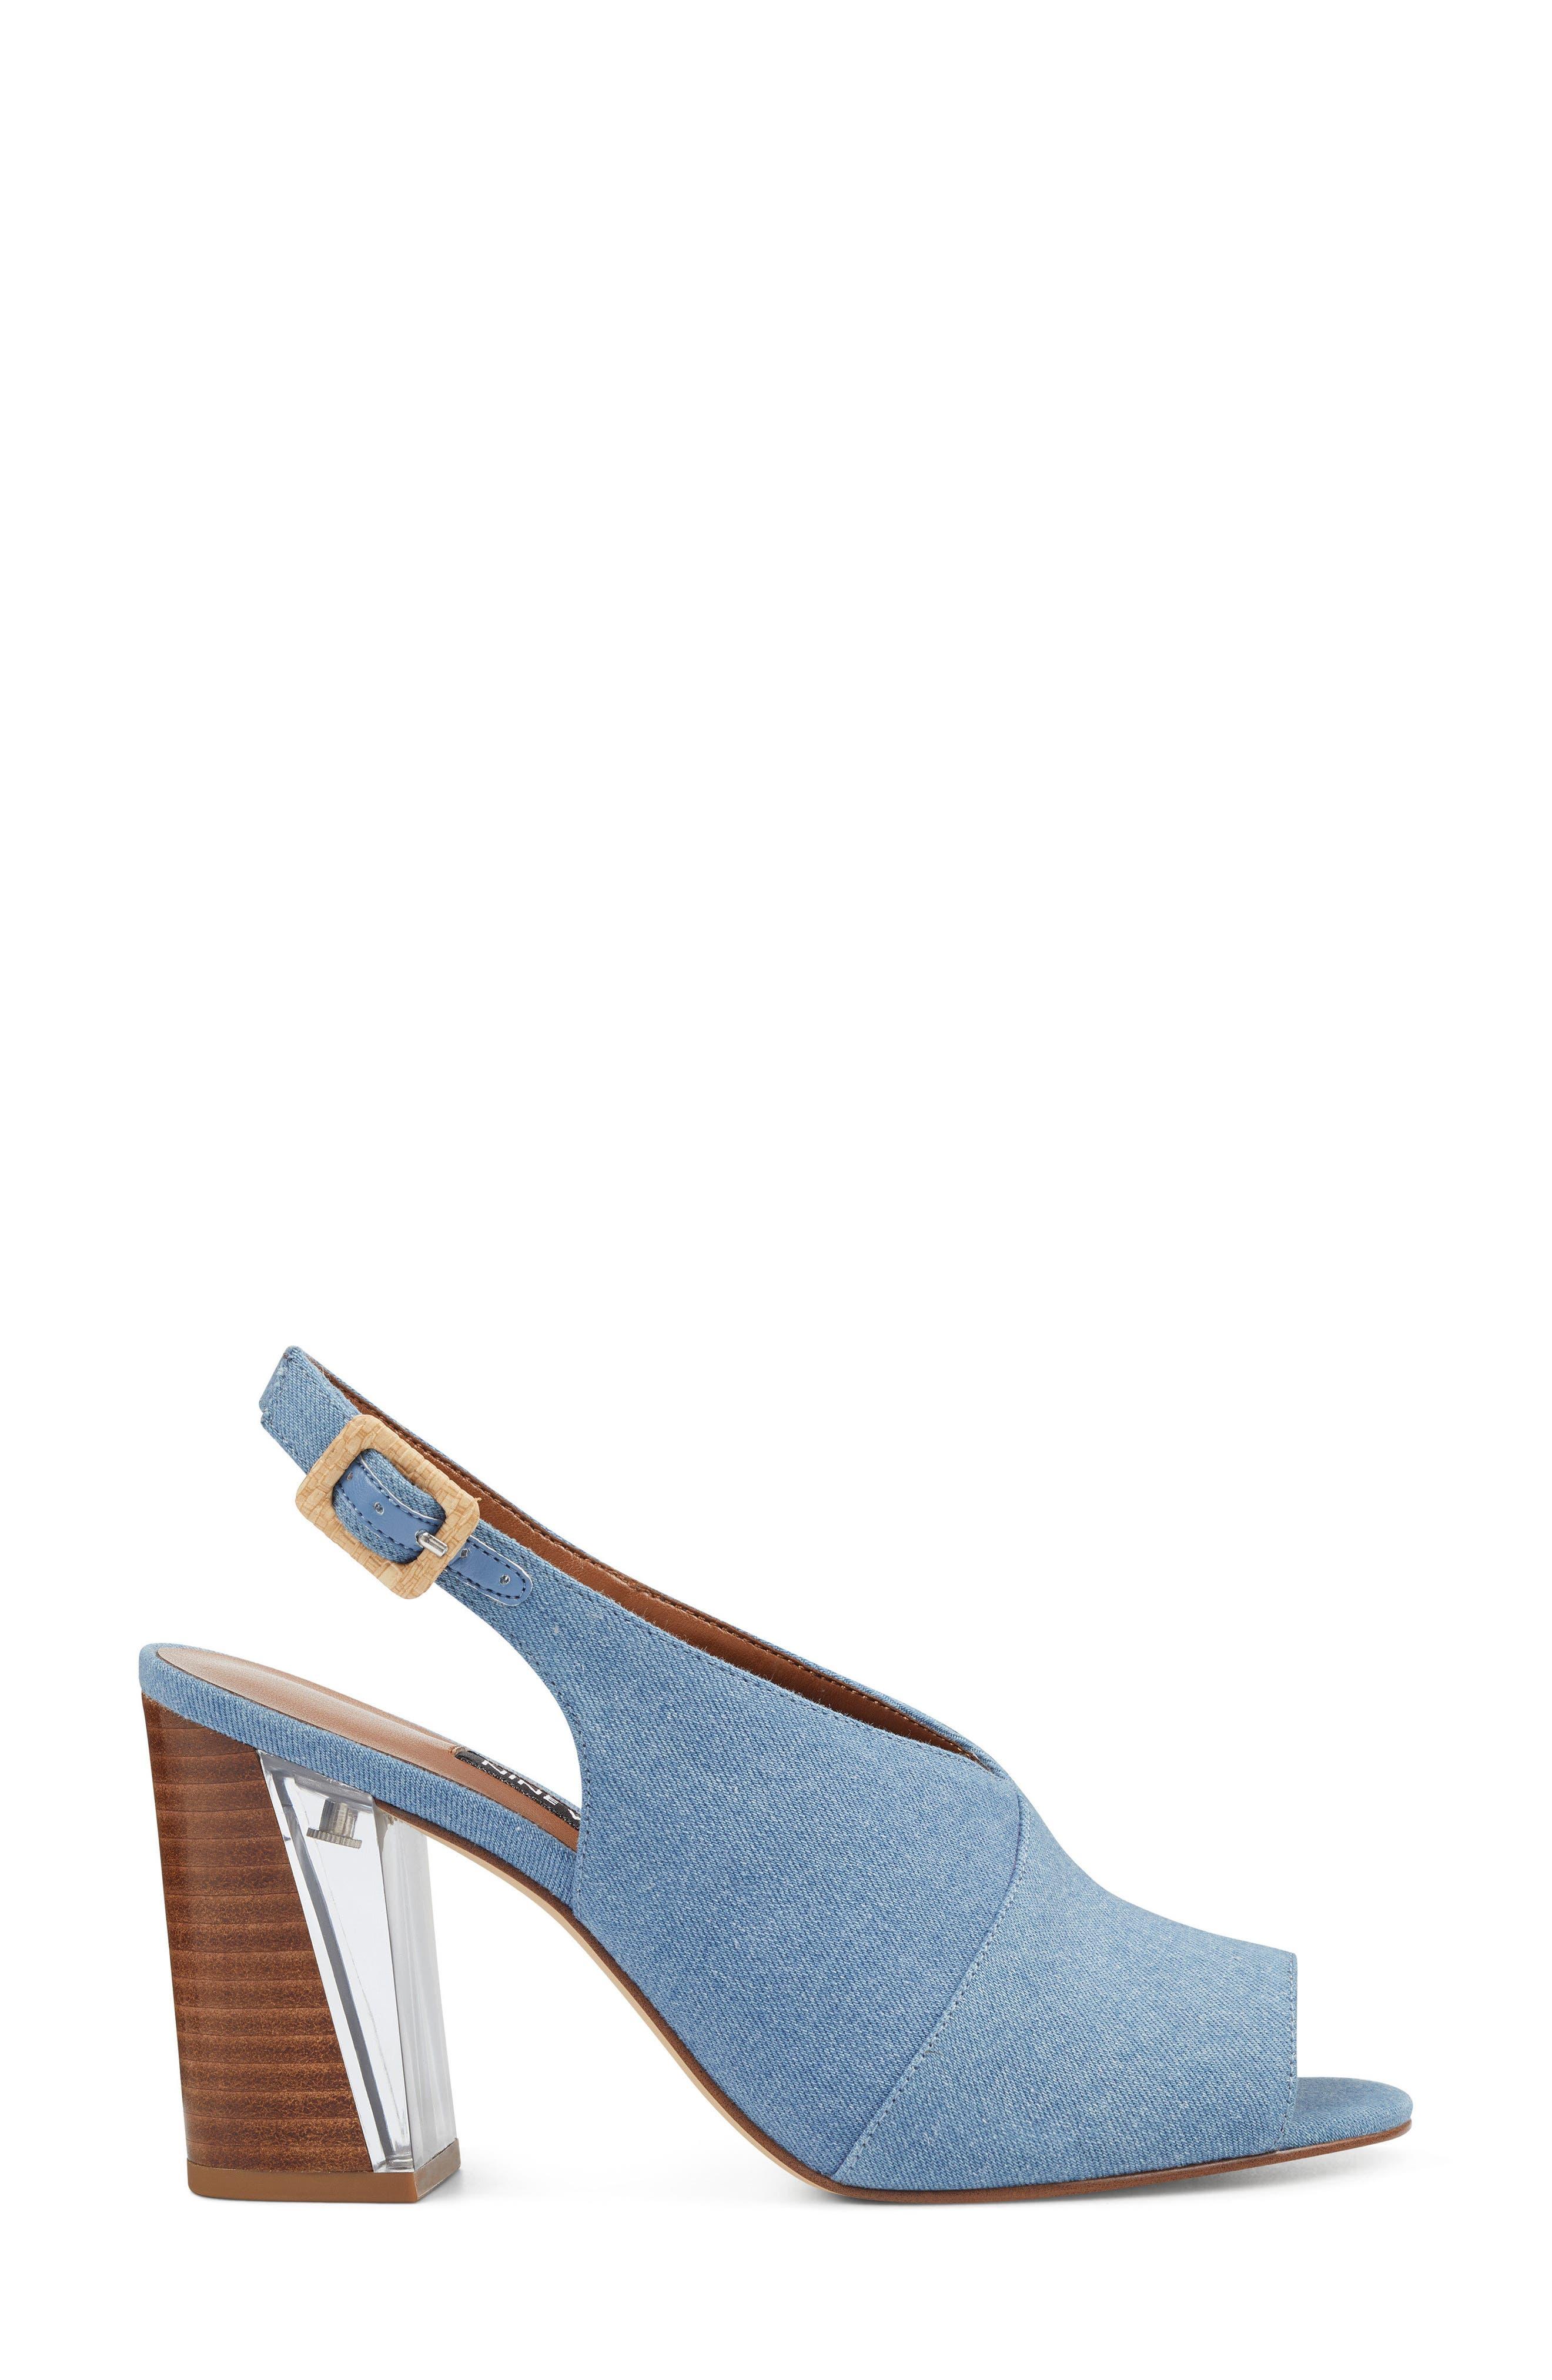 Morenzo Slingback Sandal,                             Alternate thumbnail 3, color,                             Light Blue Fabric